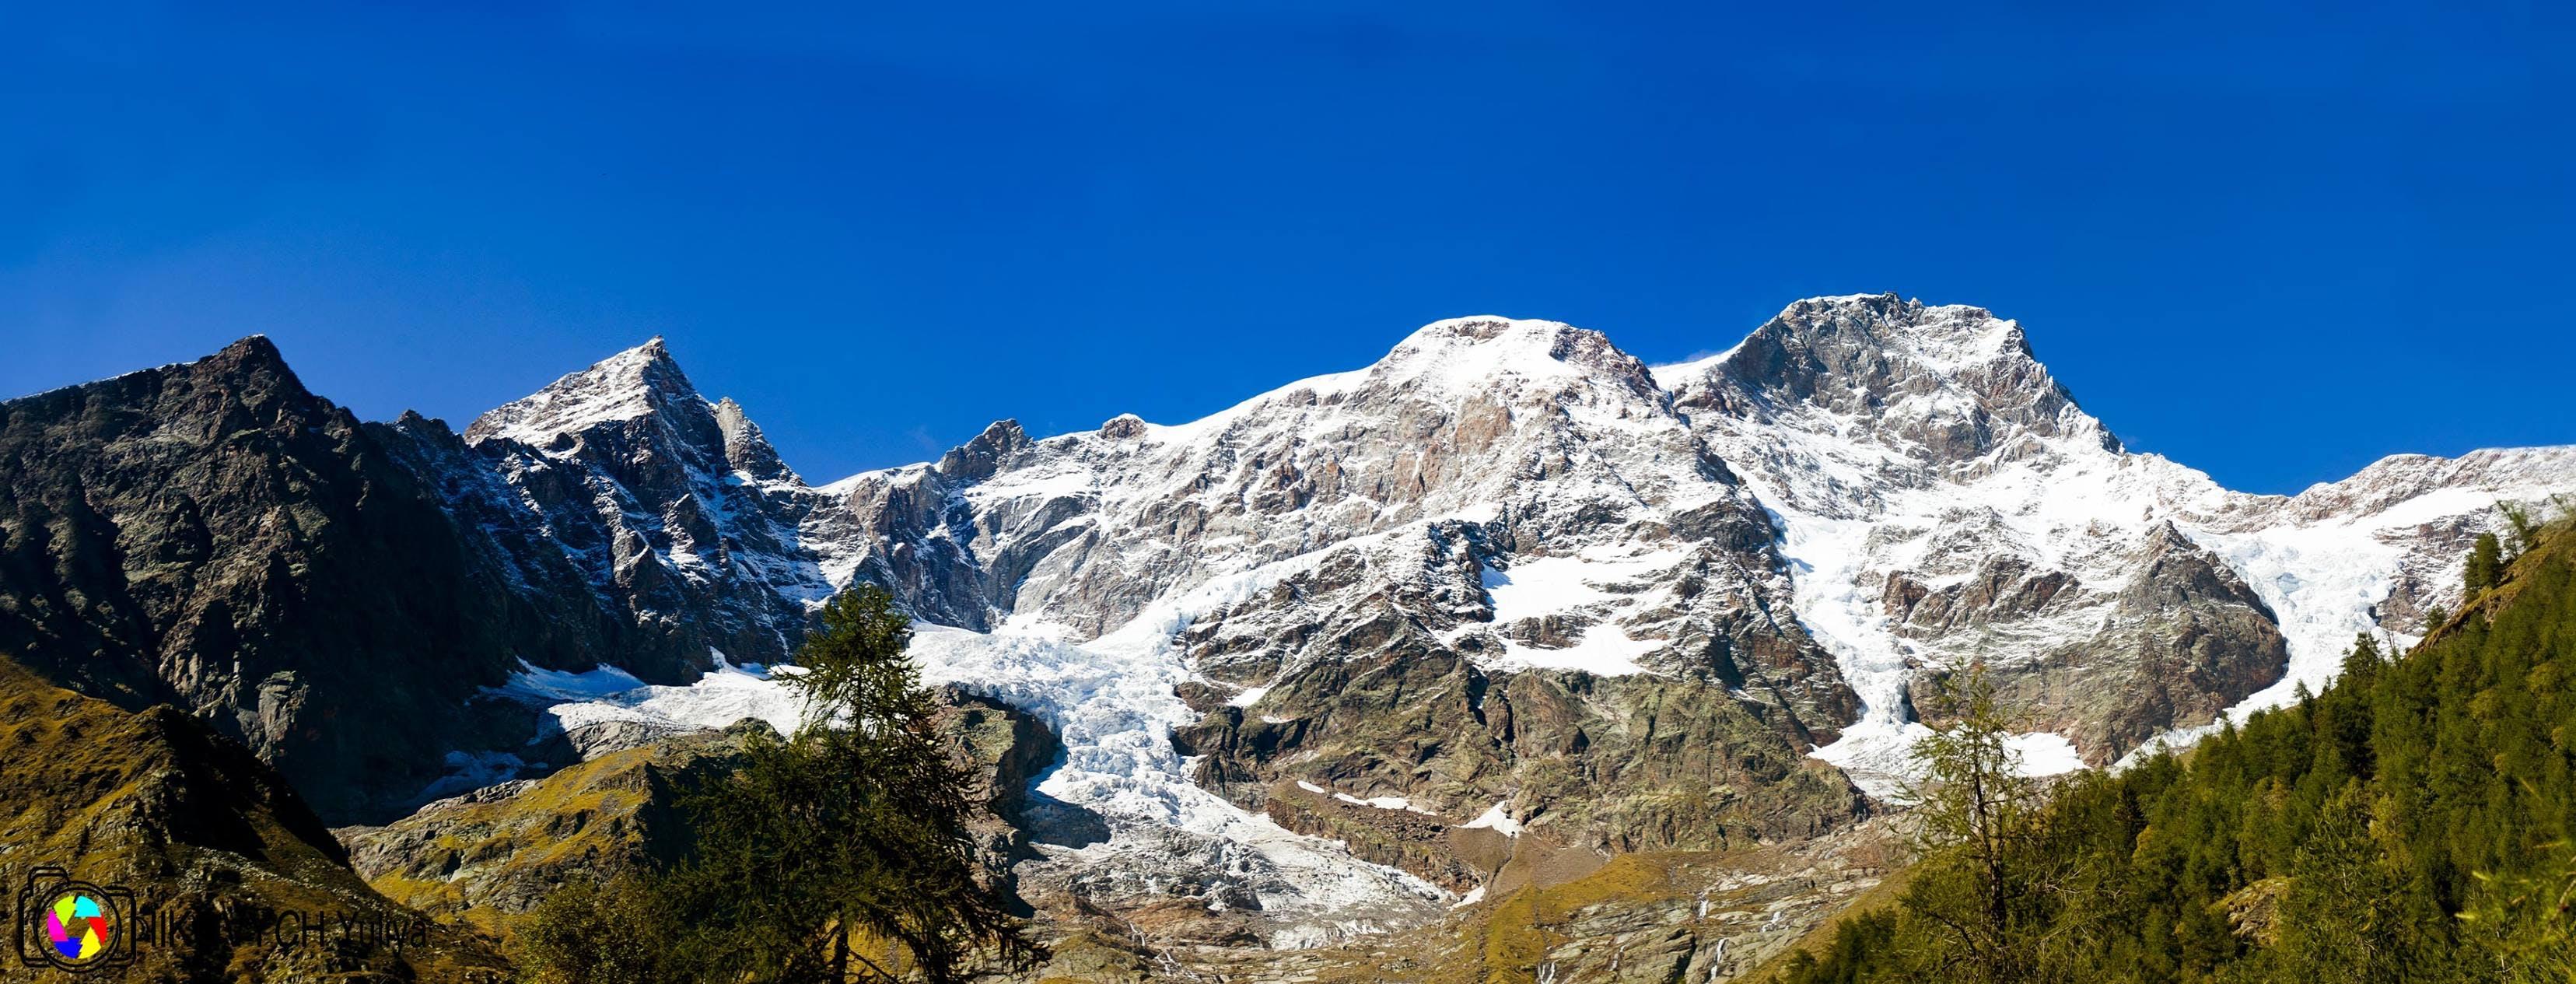 Kostenloses Stock Foto zu berg, eis, fels, gletscher